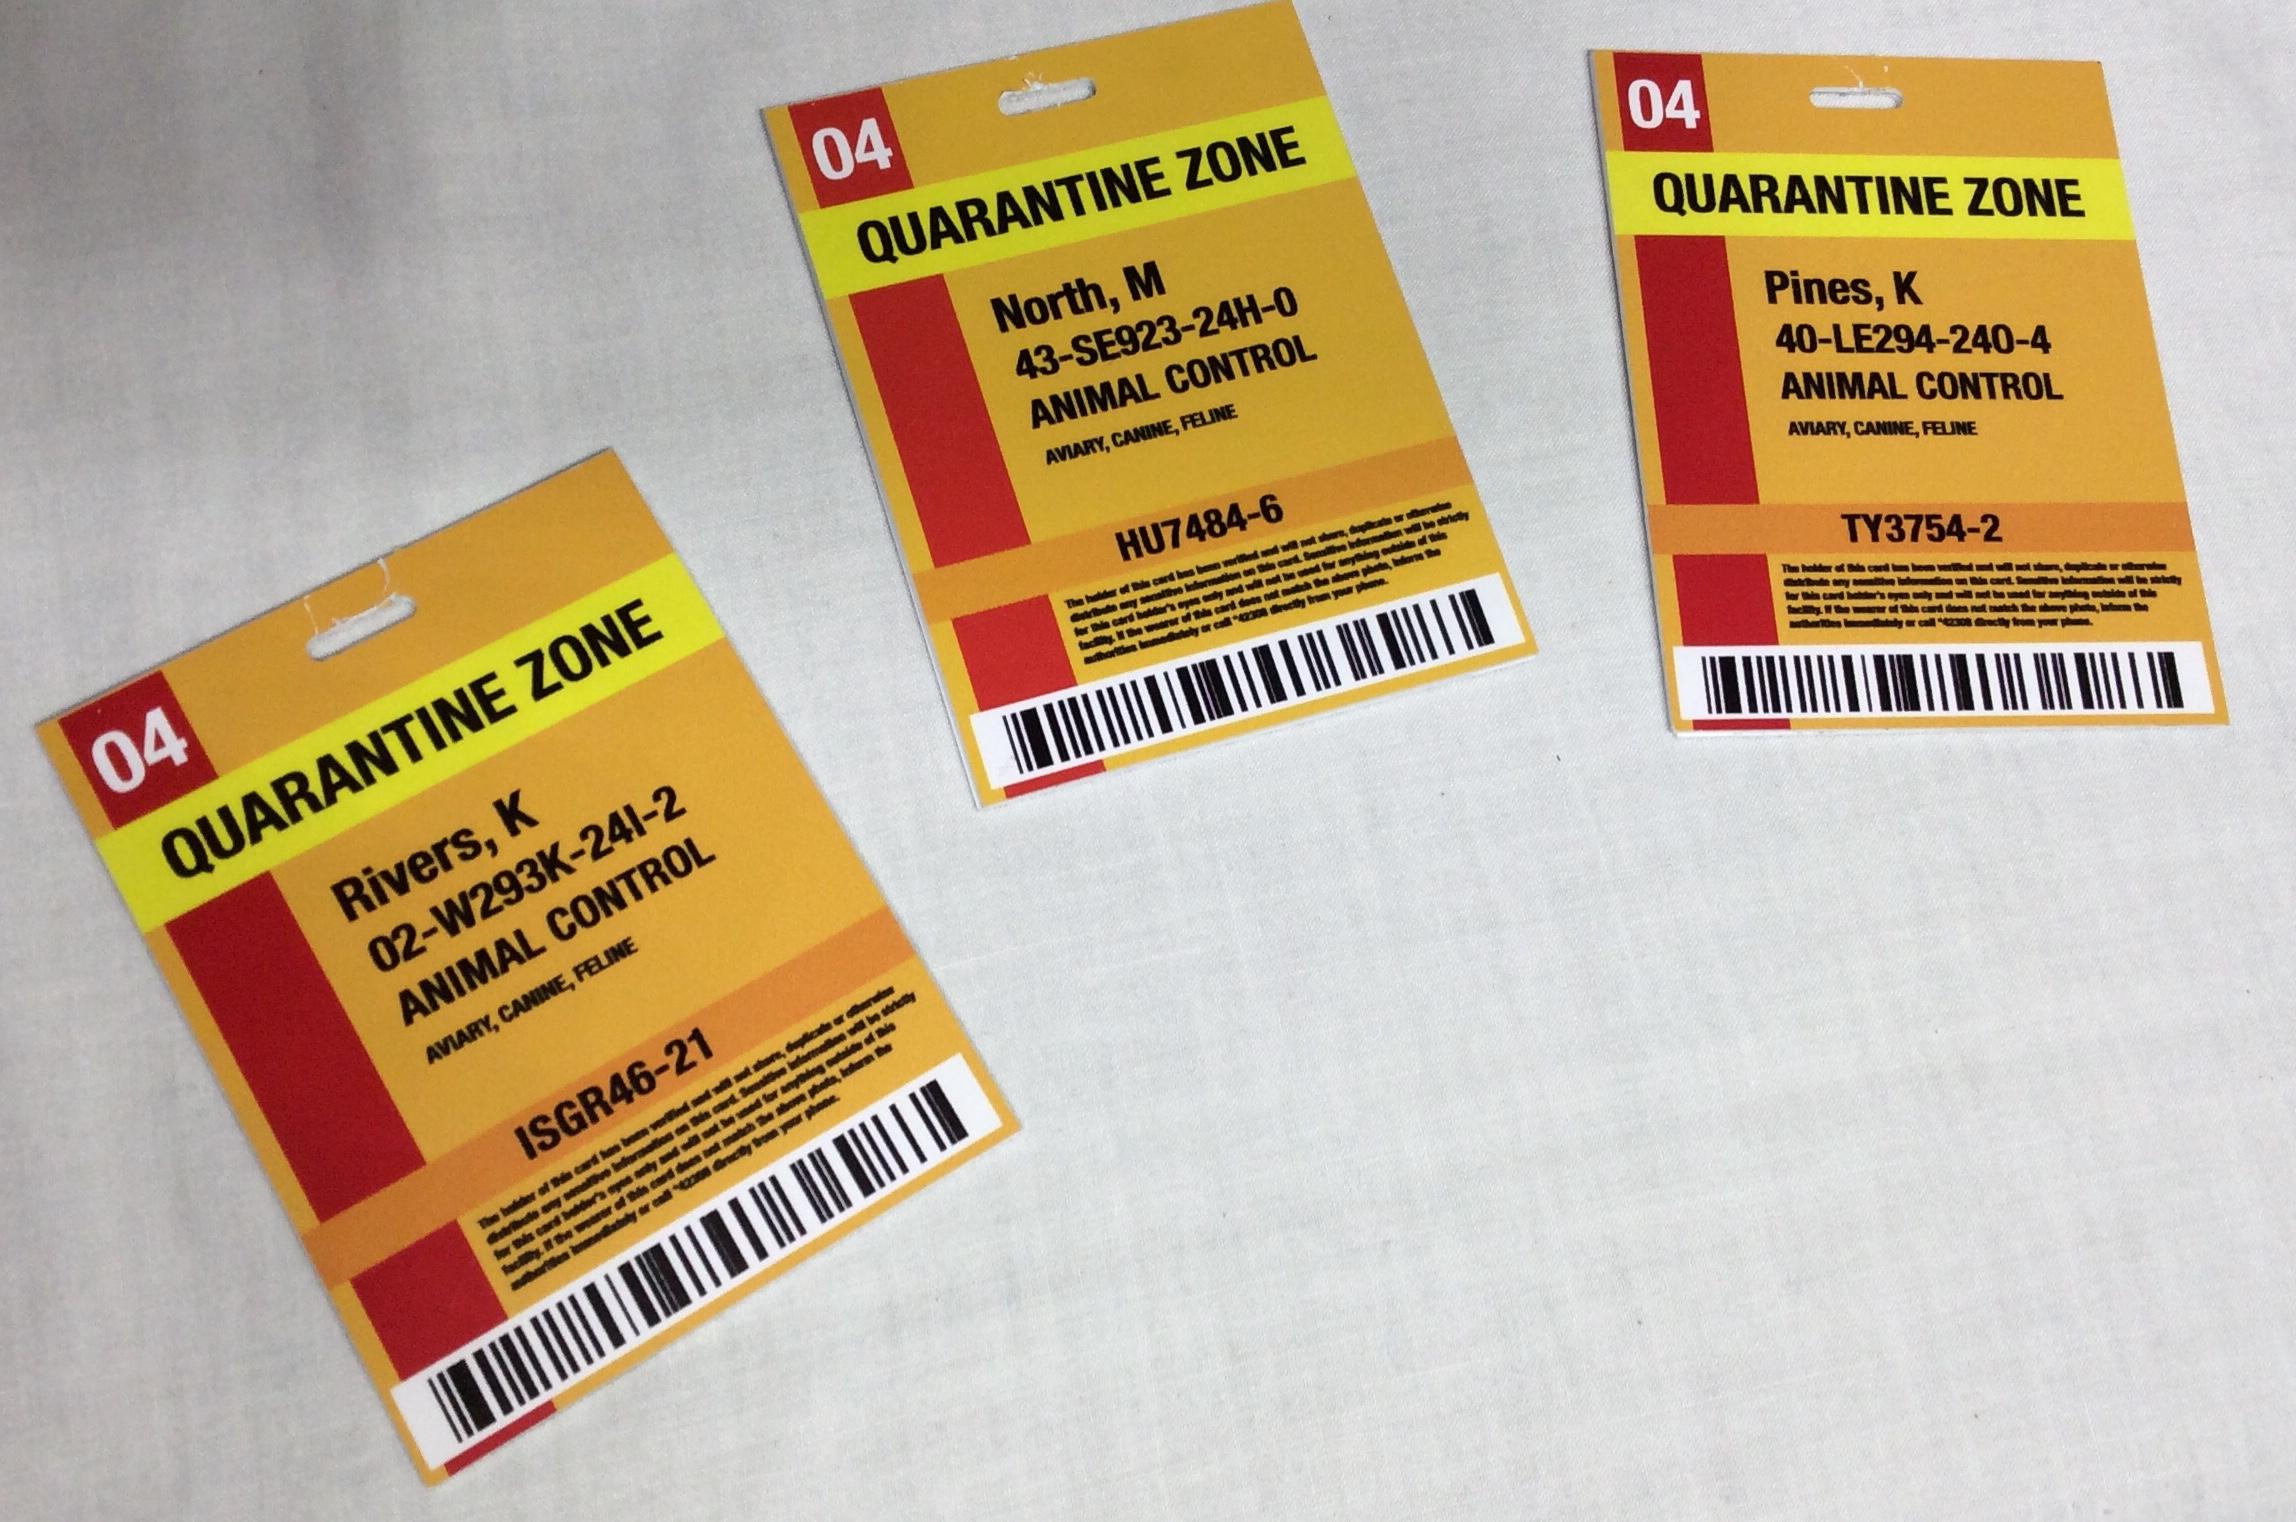 Quarantine IDs